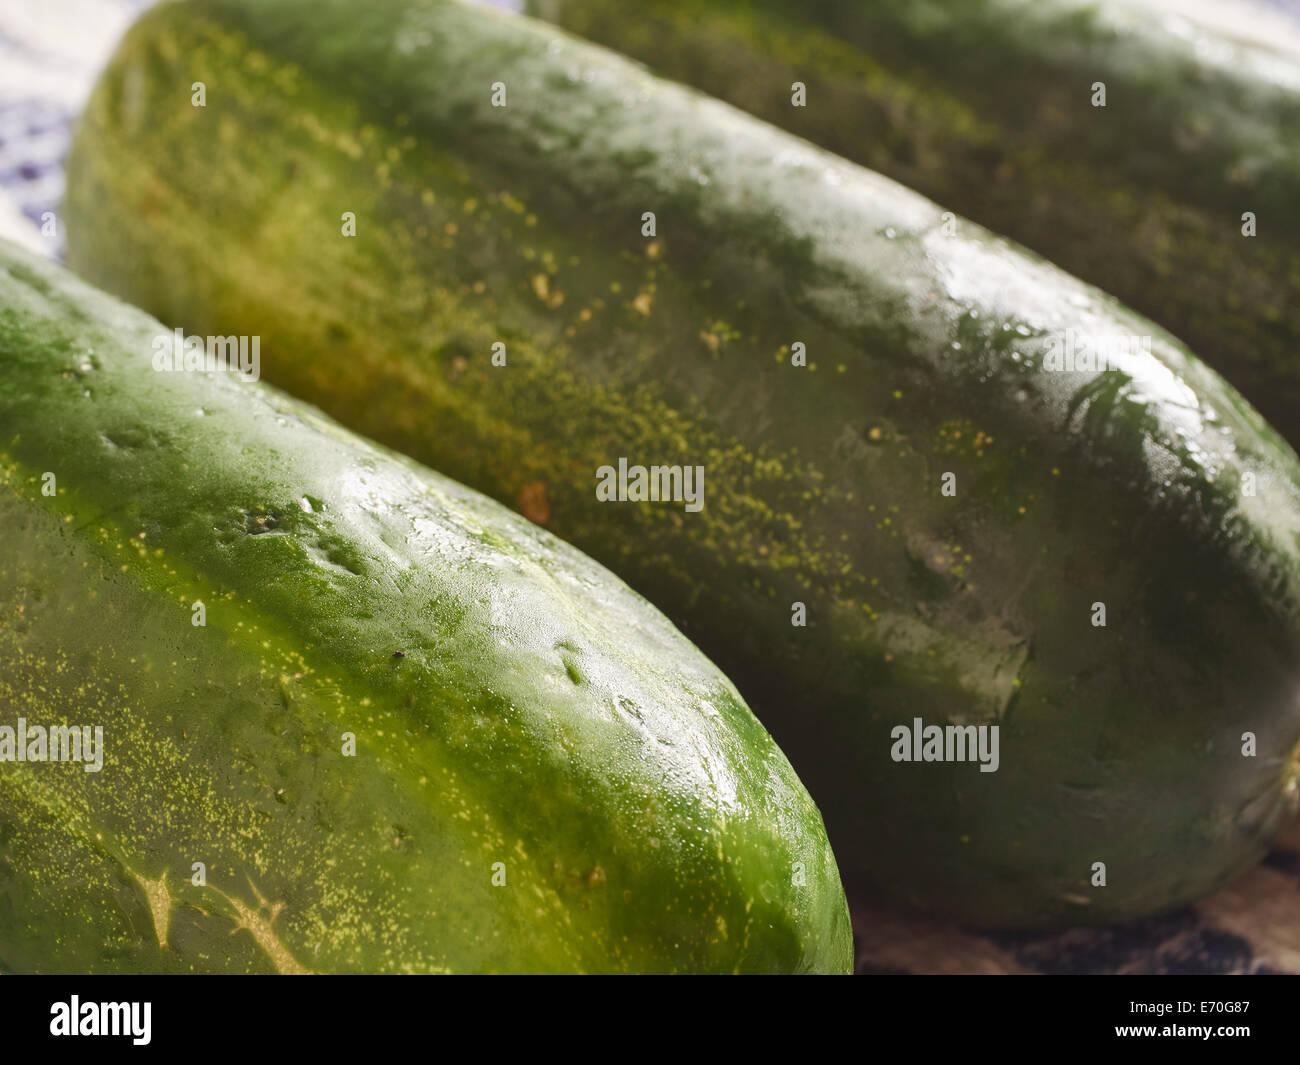 Kirby Cucumbers - Stock Image